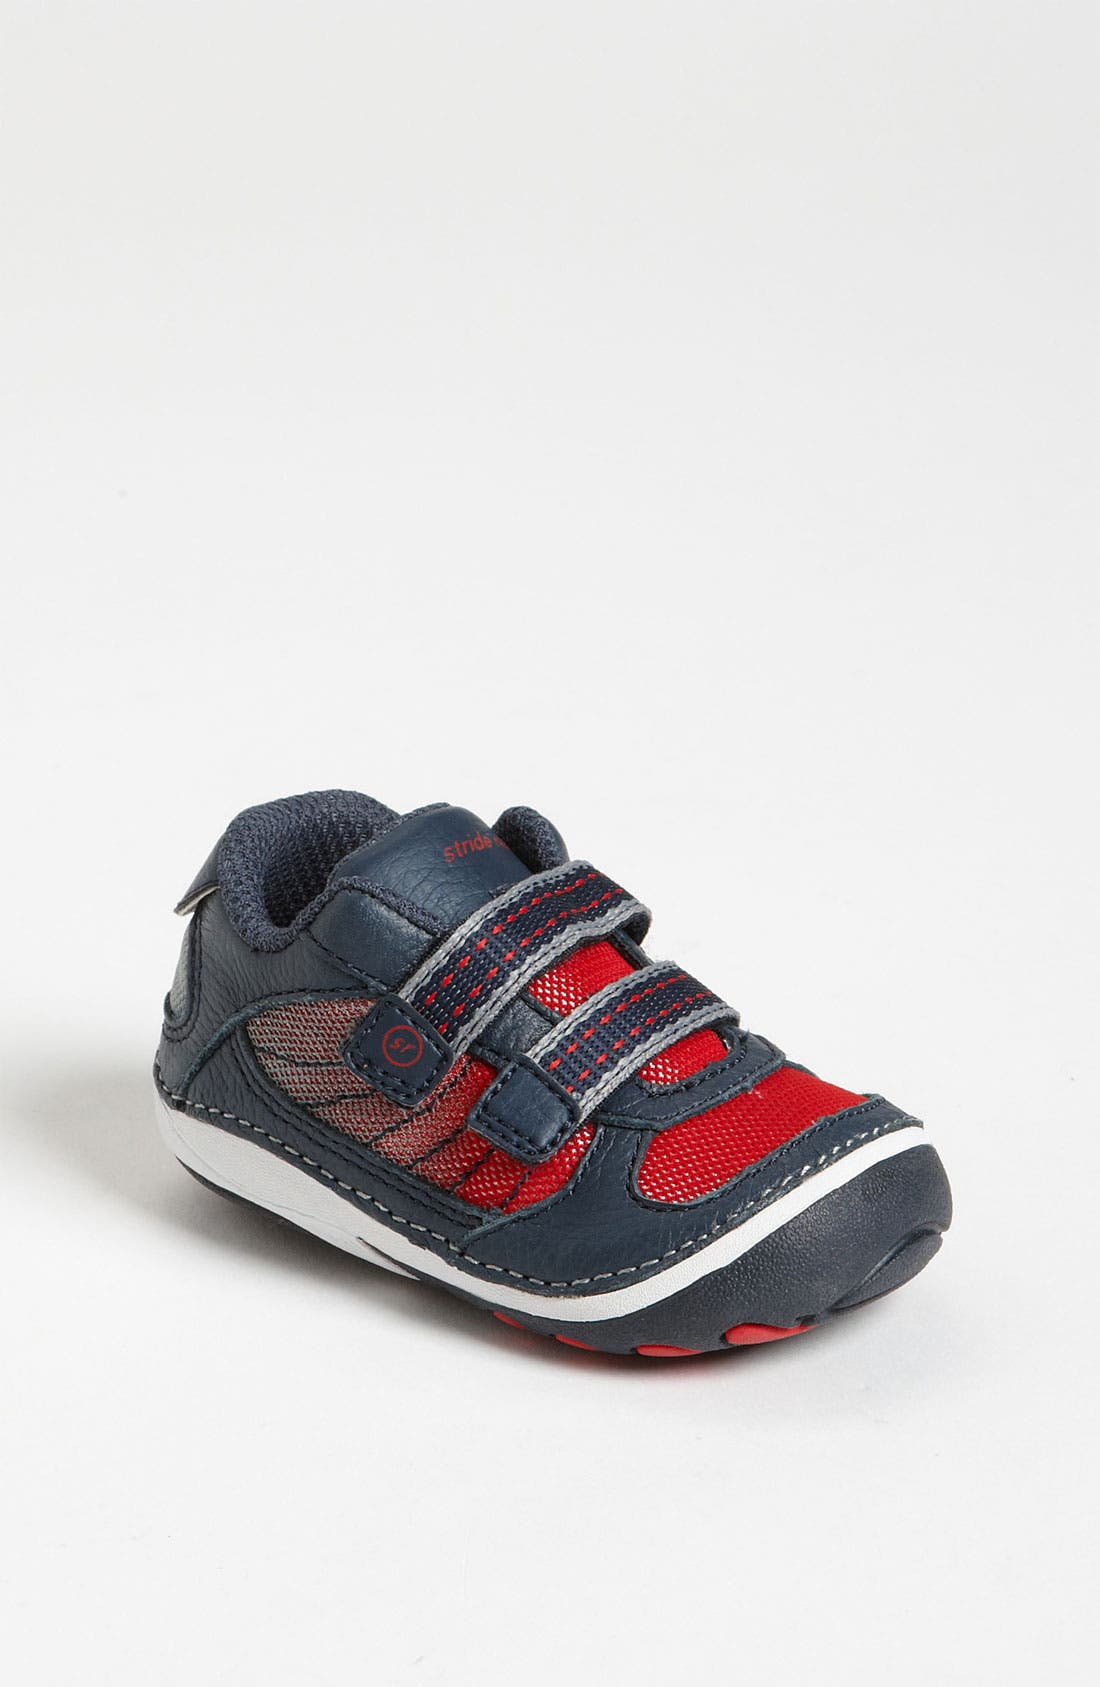 Alternate Image 1 Selected - Stride Rite 'Ronaldo' Sneaker (Baby & Walker)